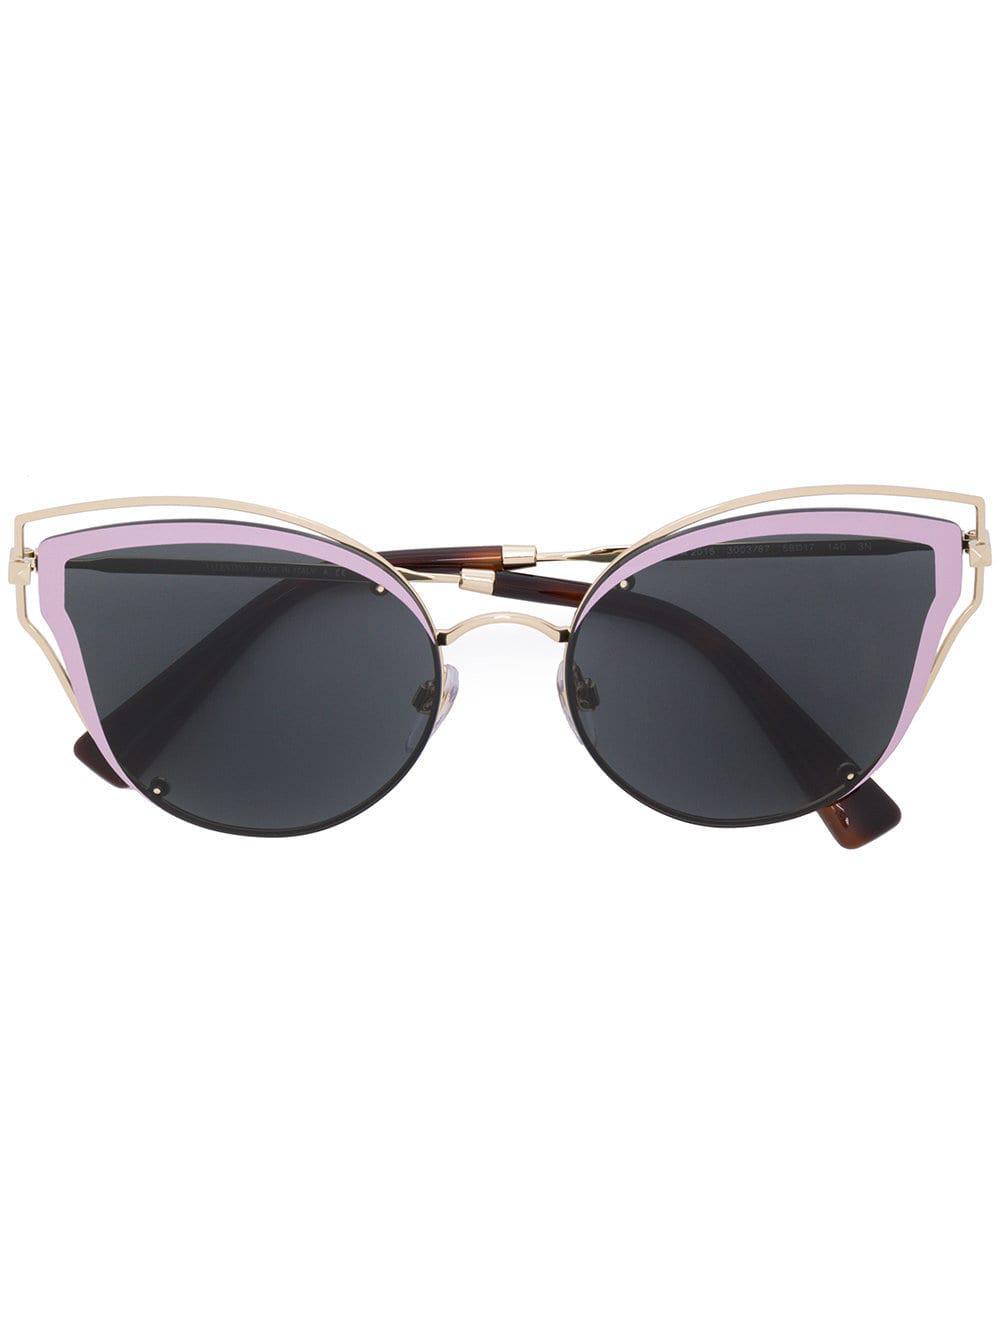 d8349be53a Valentino Eyewear Valentino Garavani Rockstud Embrace Sunglasses in ...